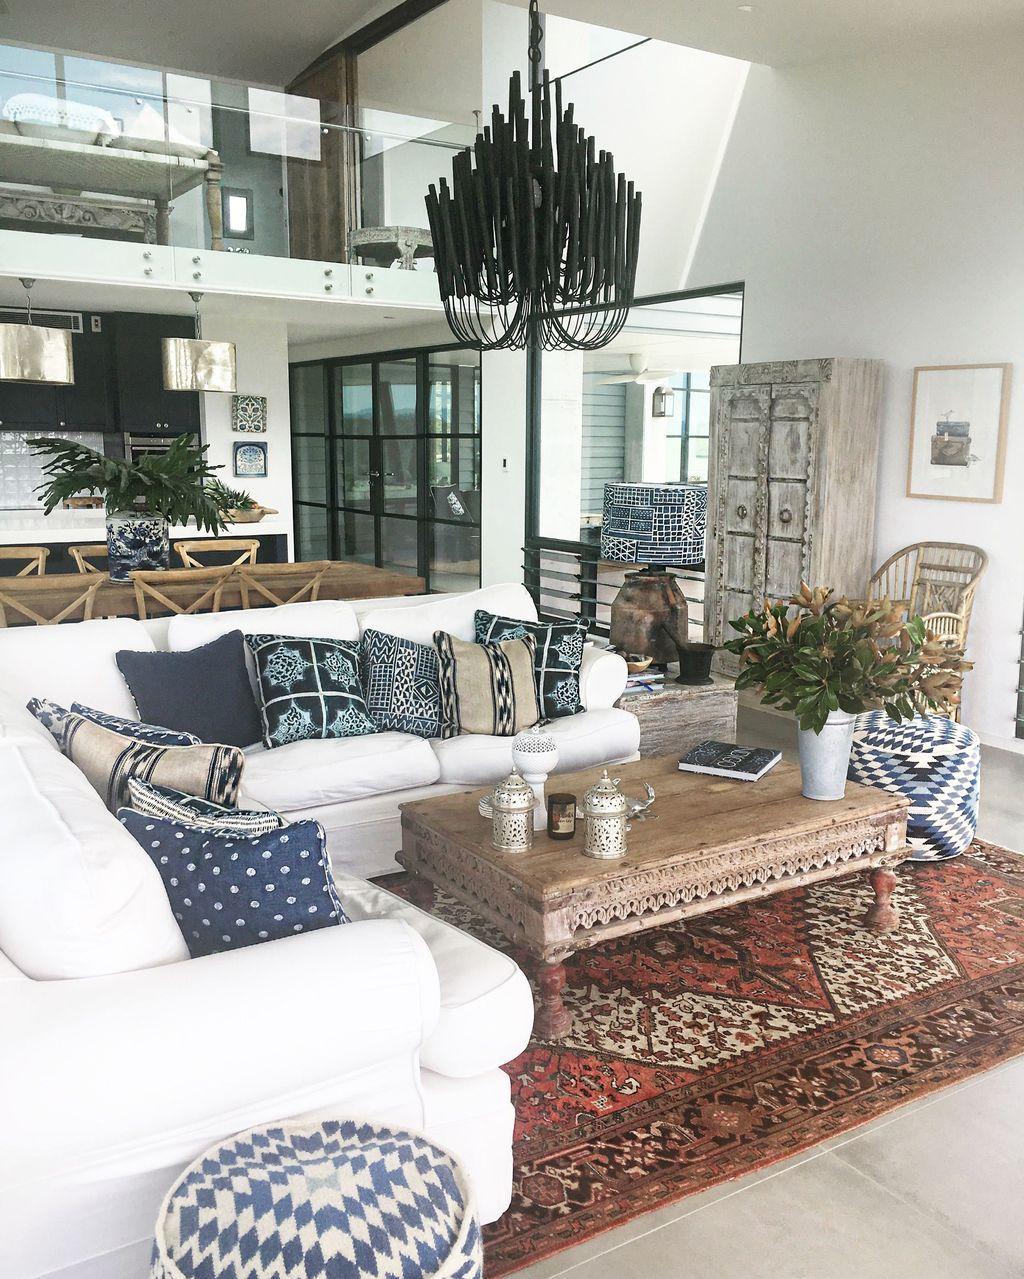 44 Beautiful Persian Rug Ideas For Living Room Decor Rugs In Living Room Persian Rug Living Room Living Room Carpet